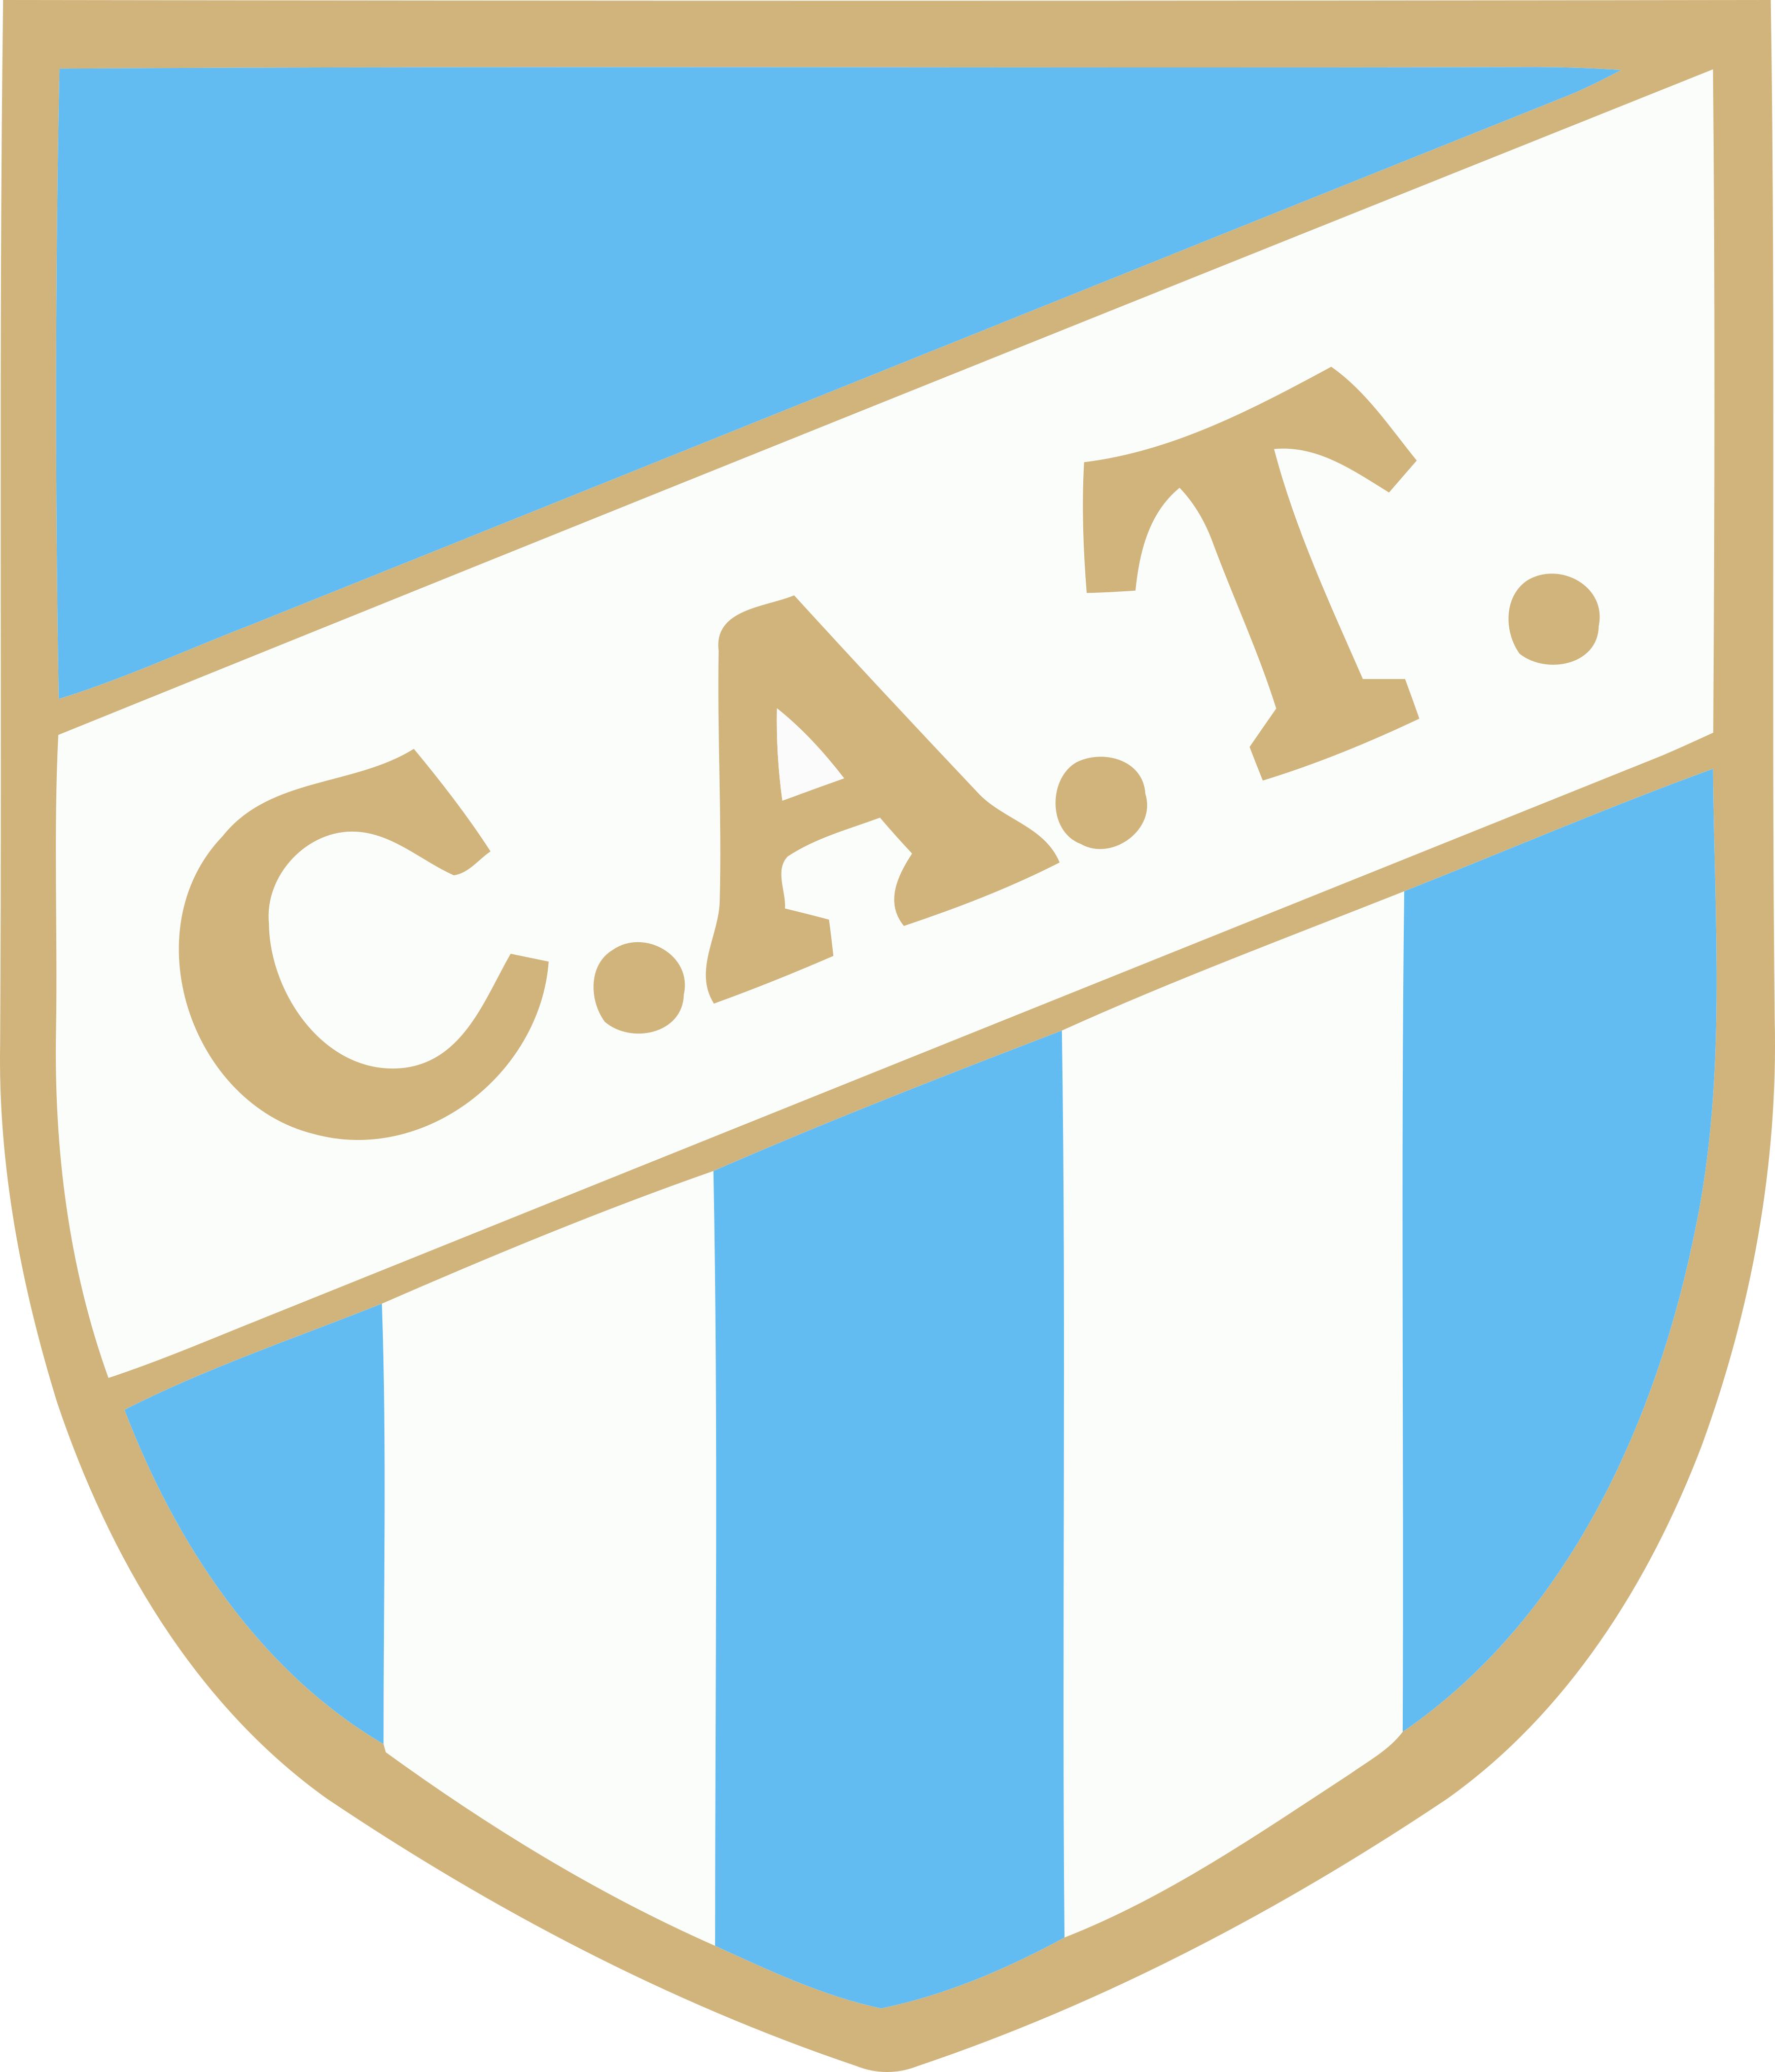 atletico tucuman logo escudo - Club Atlético Tucumán Logo